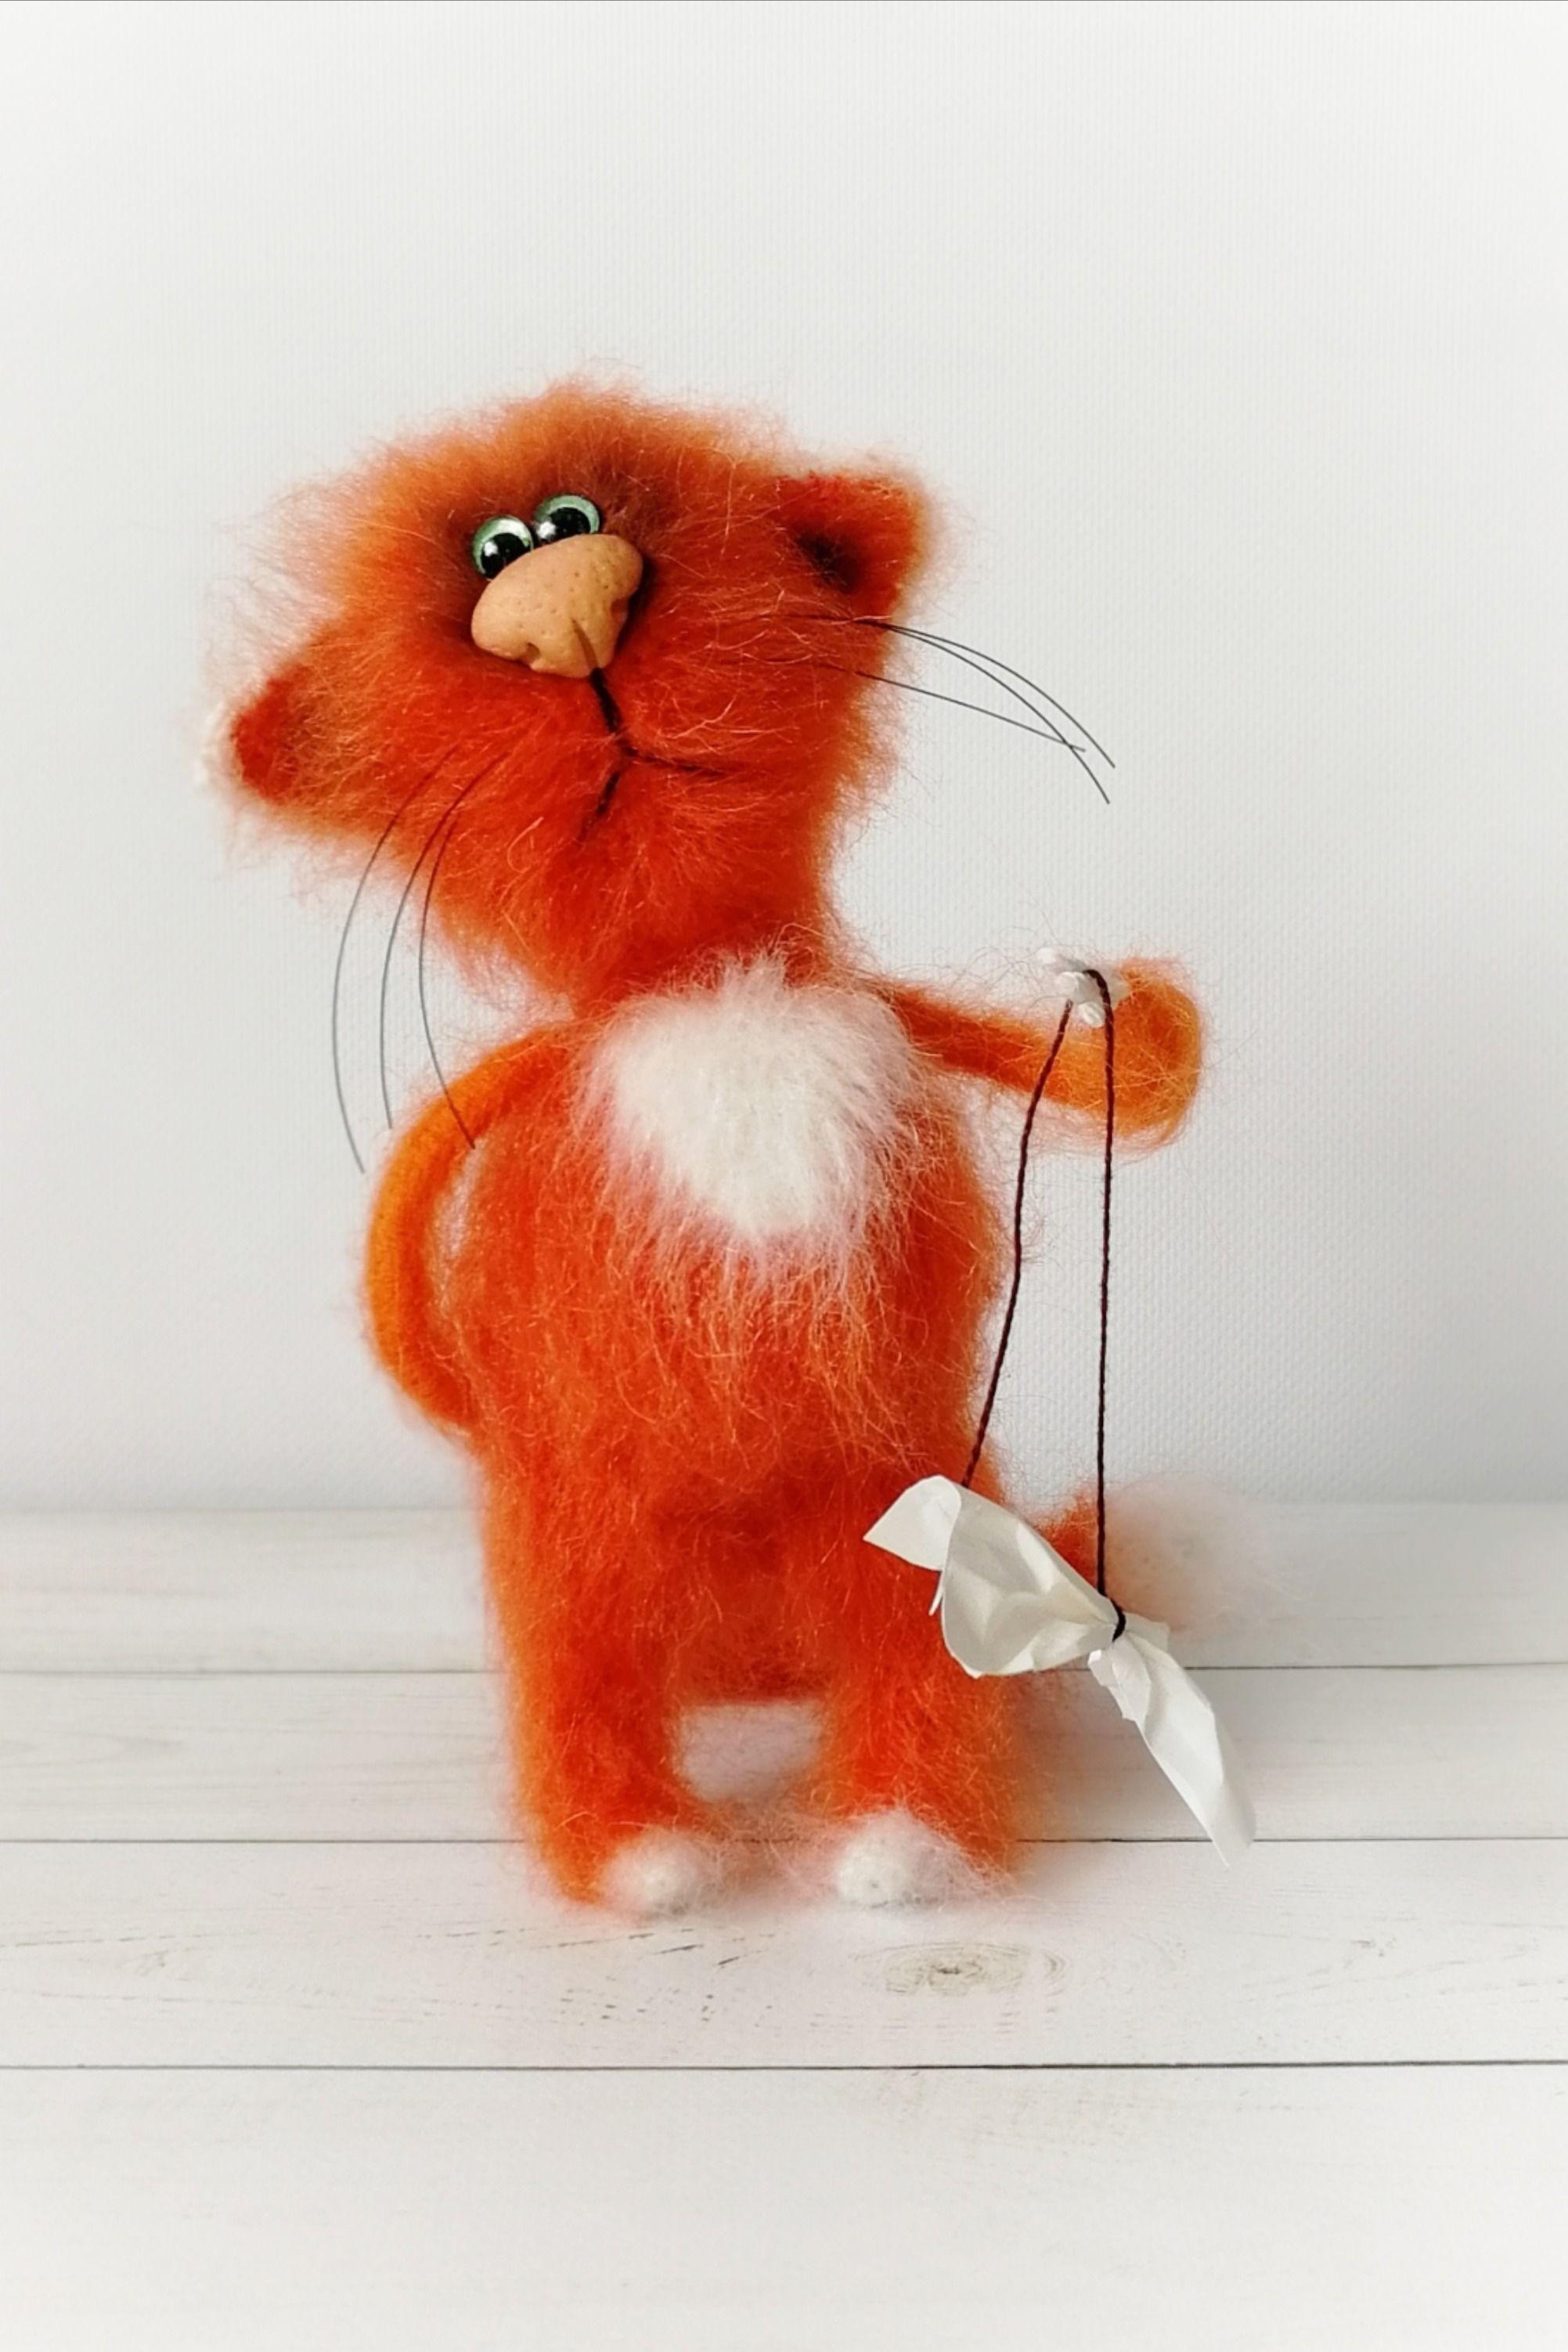 Figurine cat toy, stuffed kitten, miniature red animal